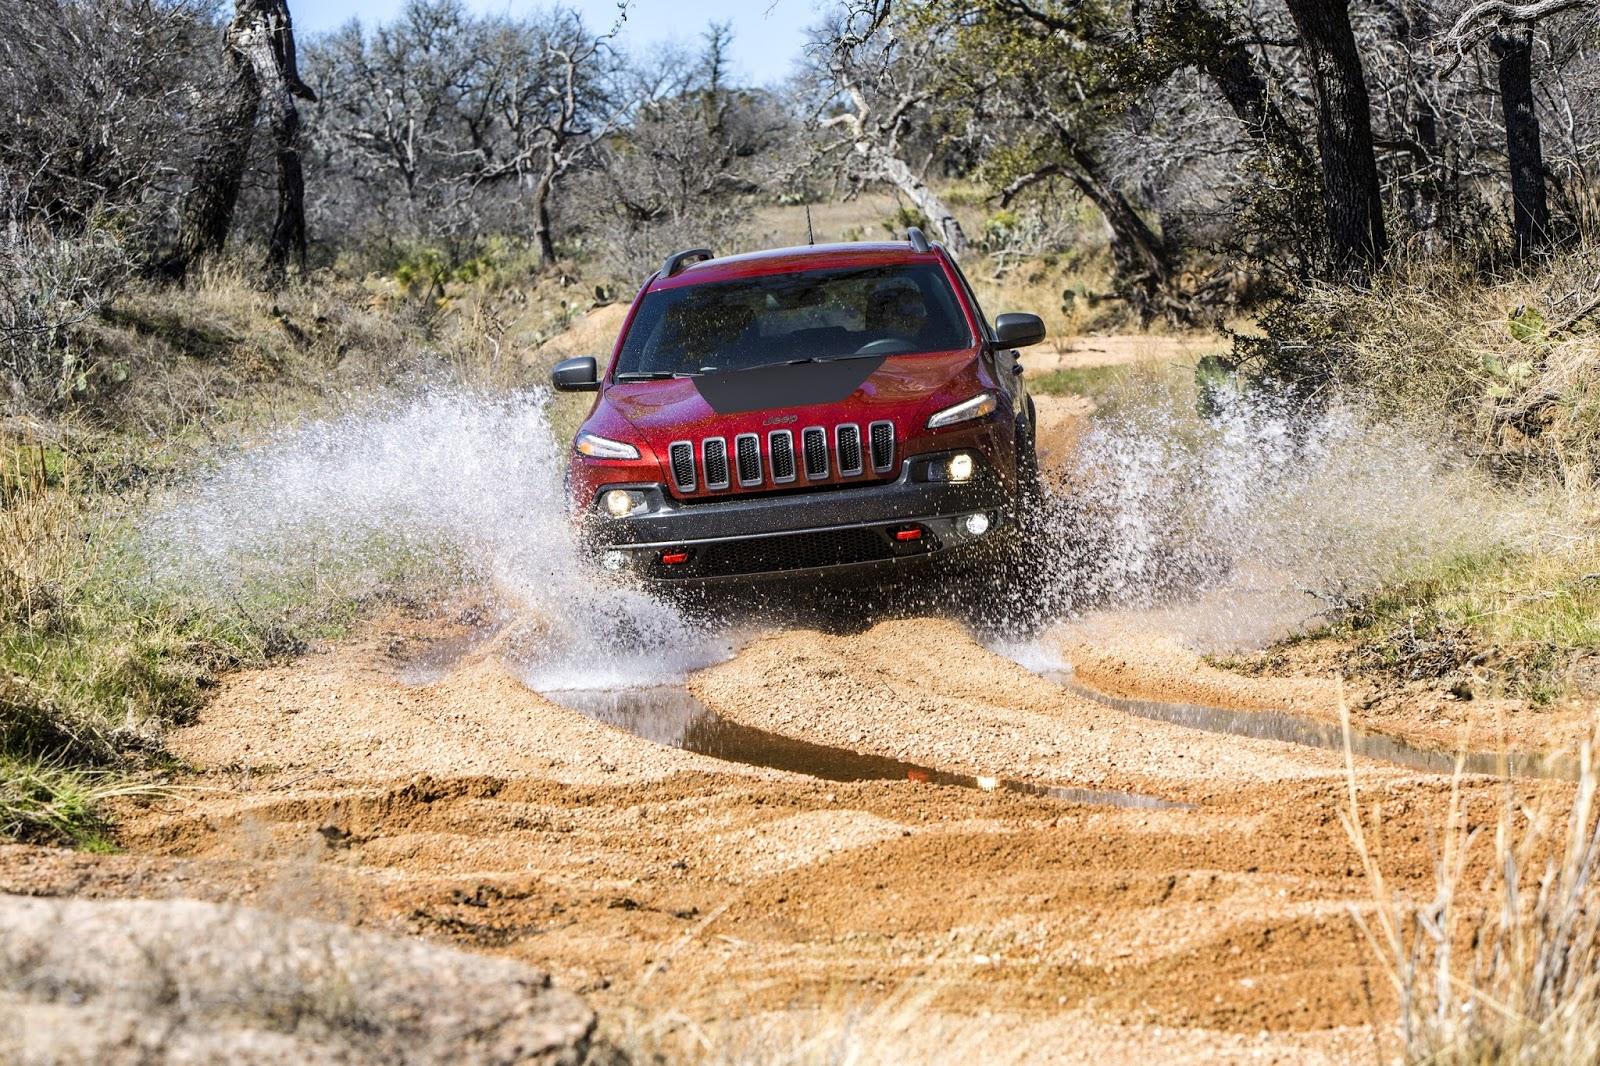 SIMPLIROMATIKH%2BFOTO2 Δοκιμάζουμε αν το νέο Jeep Cherokee… κολλάει πουθενά Jeep, Jeep Cherokee, TEST, zblog, ΔΟΚΙΜΕΣ